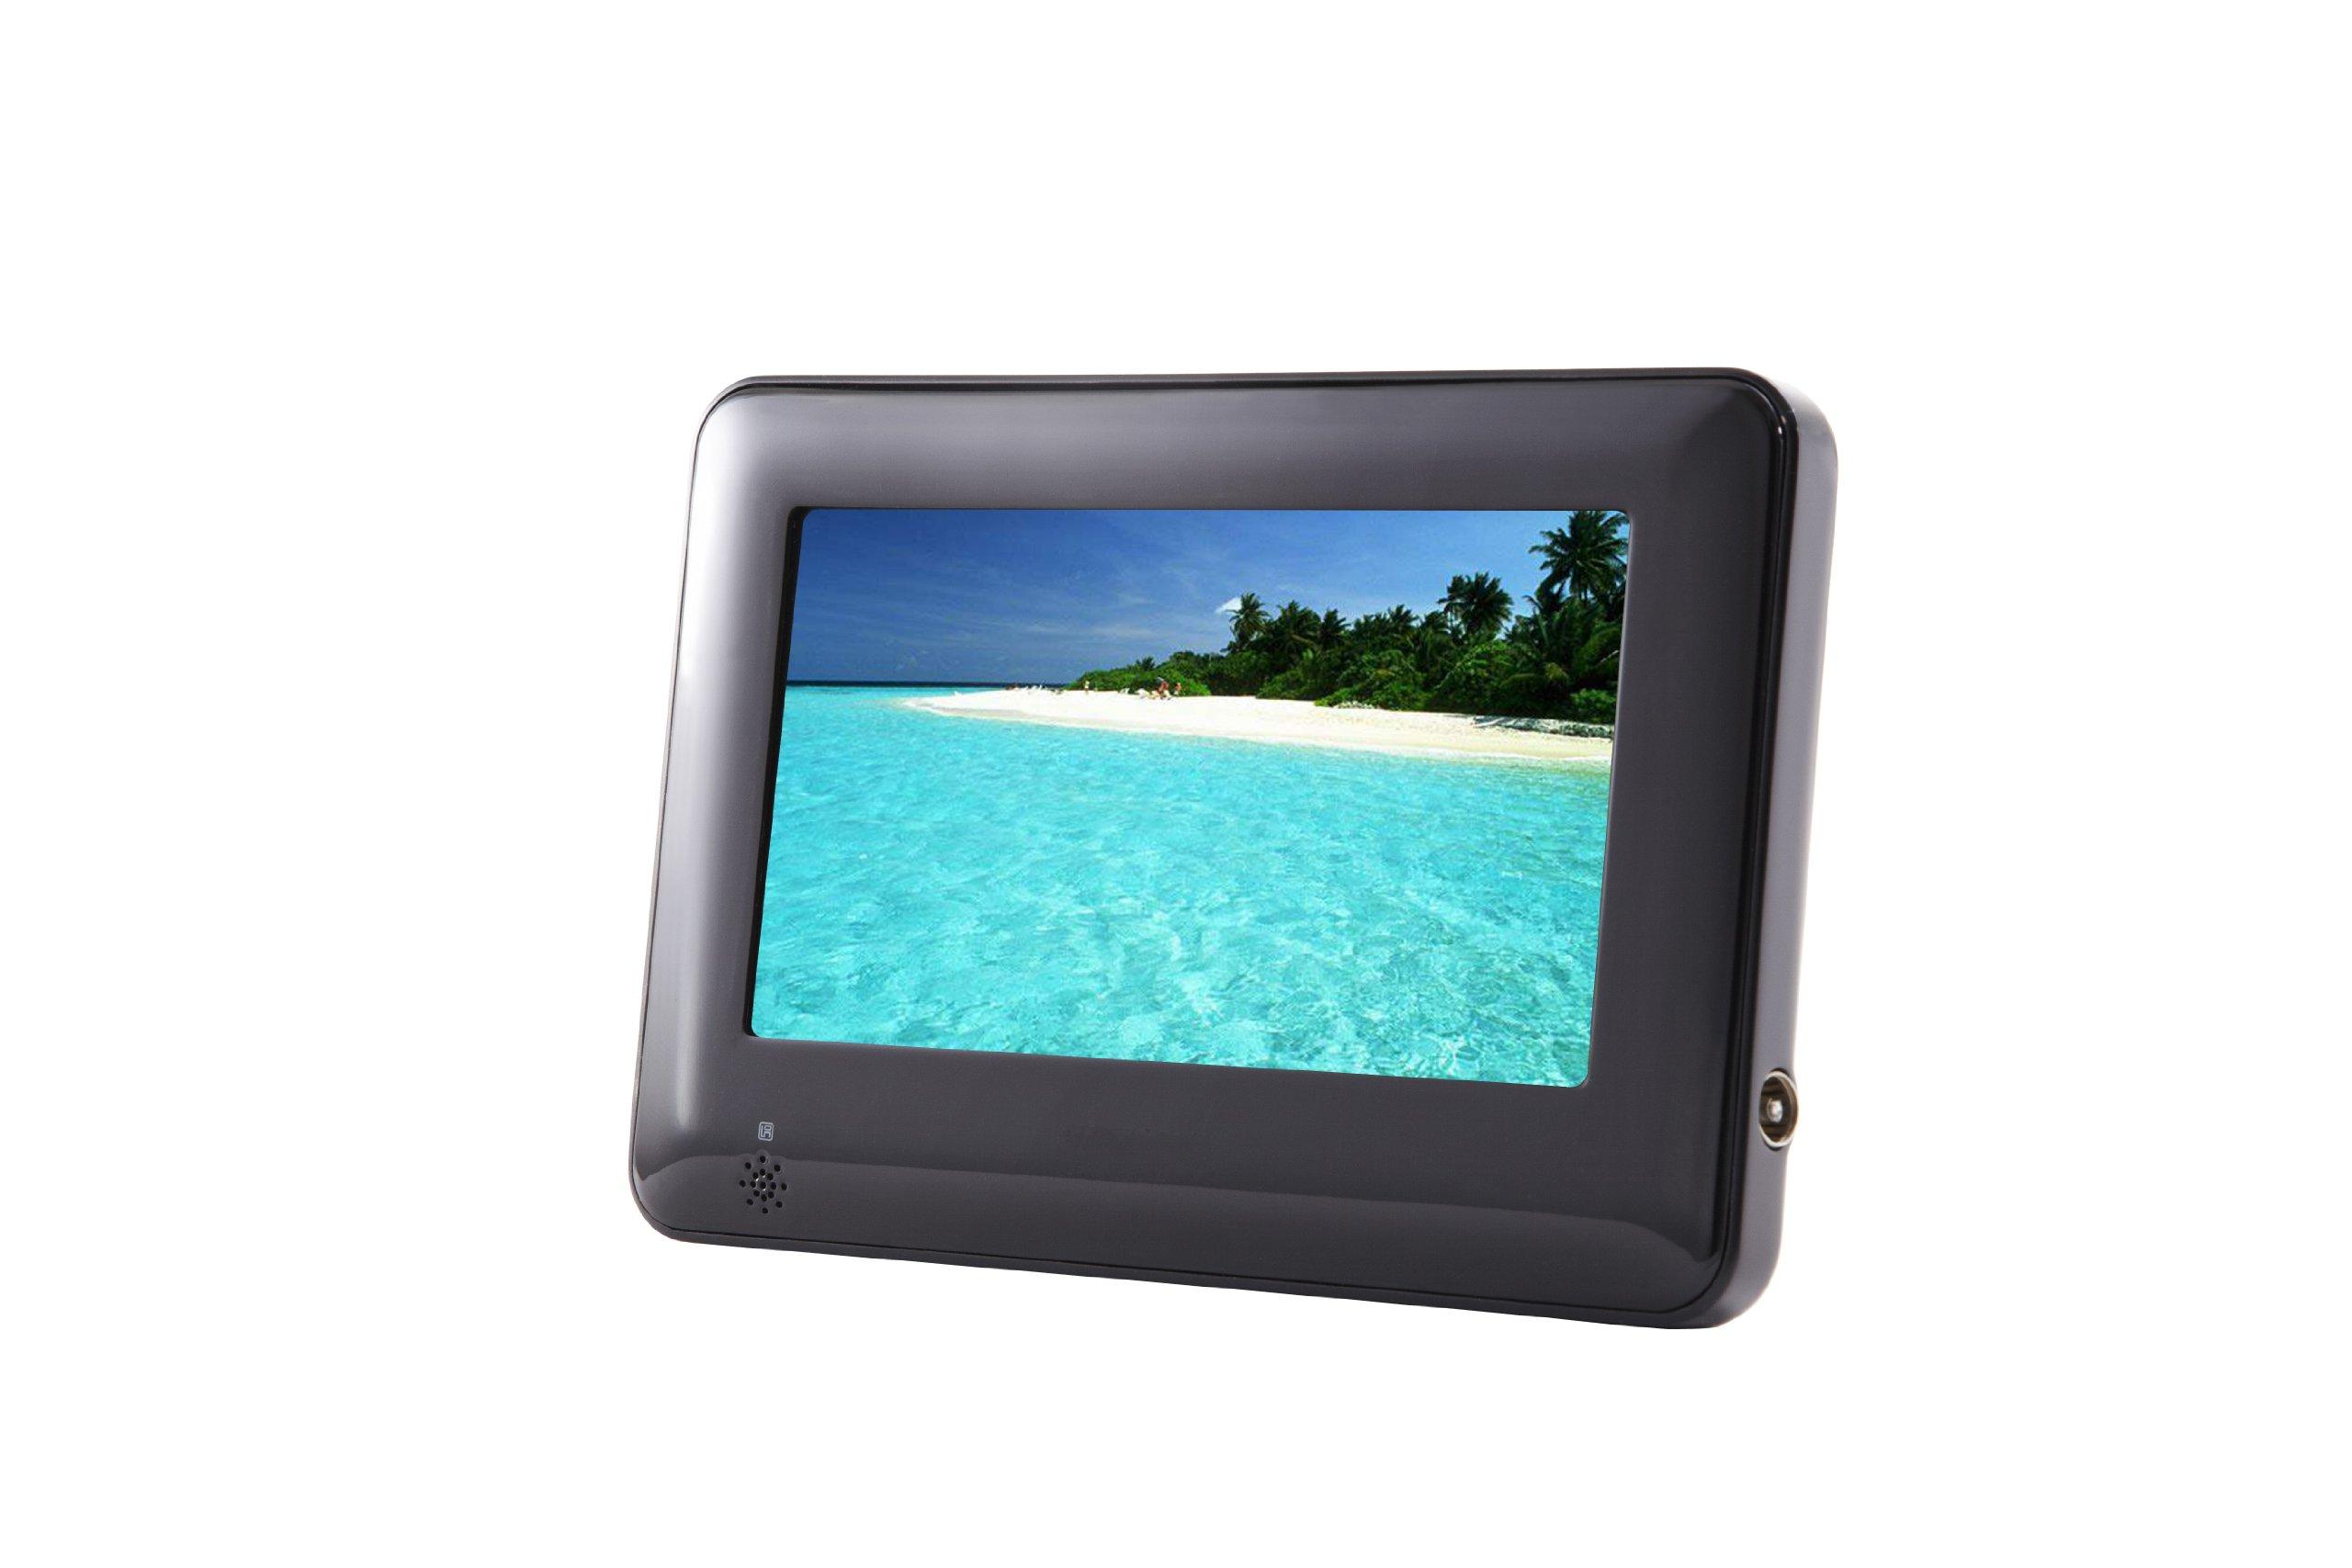 Sylvania SDVD7061 7-Inch Portable Tablet DVD/CD/MP3 Player, Built-In USB/SD Card Reader and Car Bag/Kit (Black)